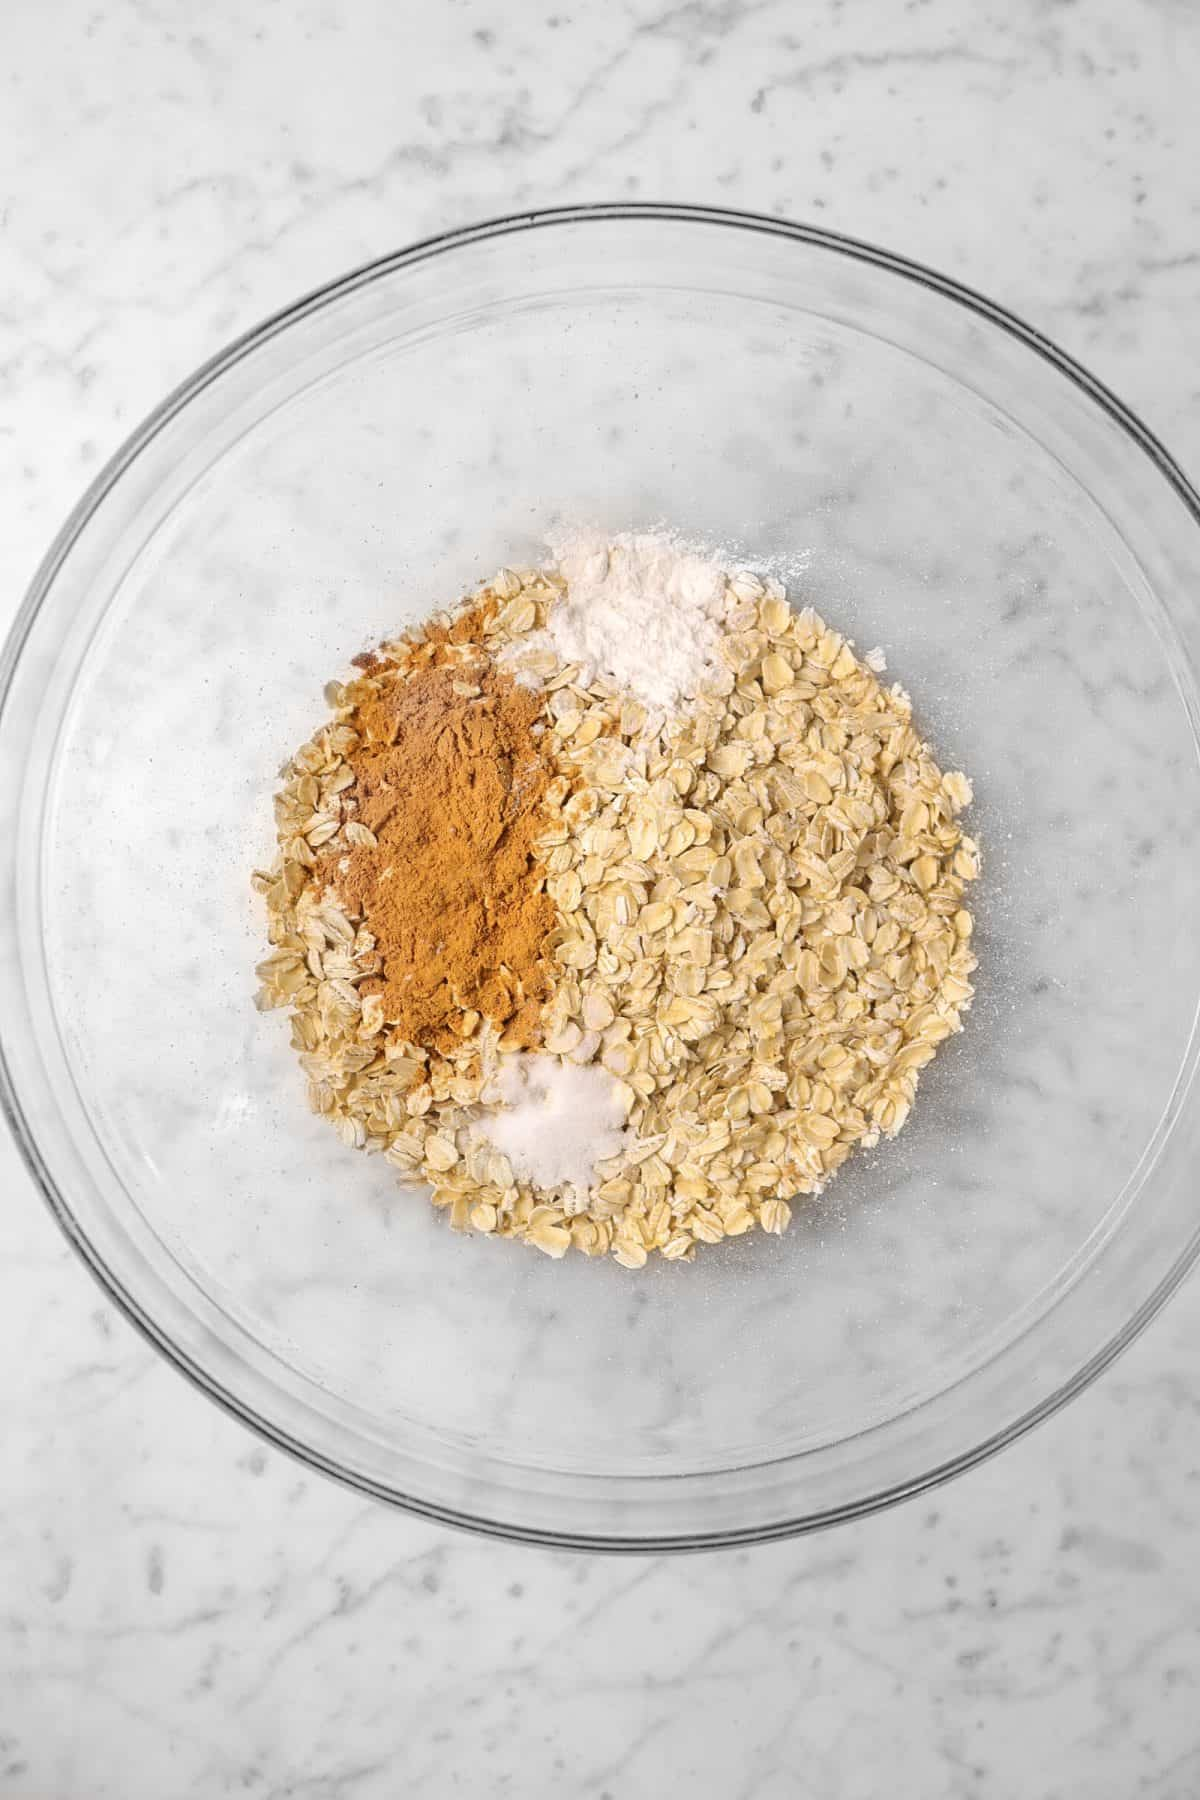 oatmeal, cinnamon, salt, and baking powder in a bowl